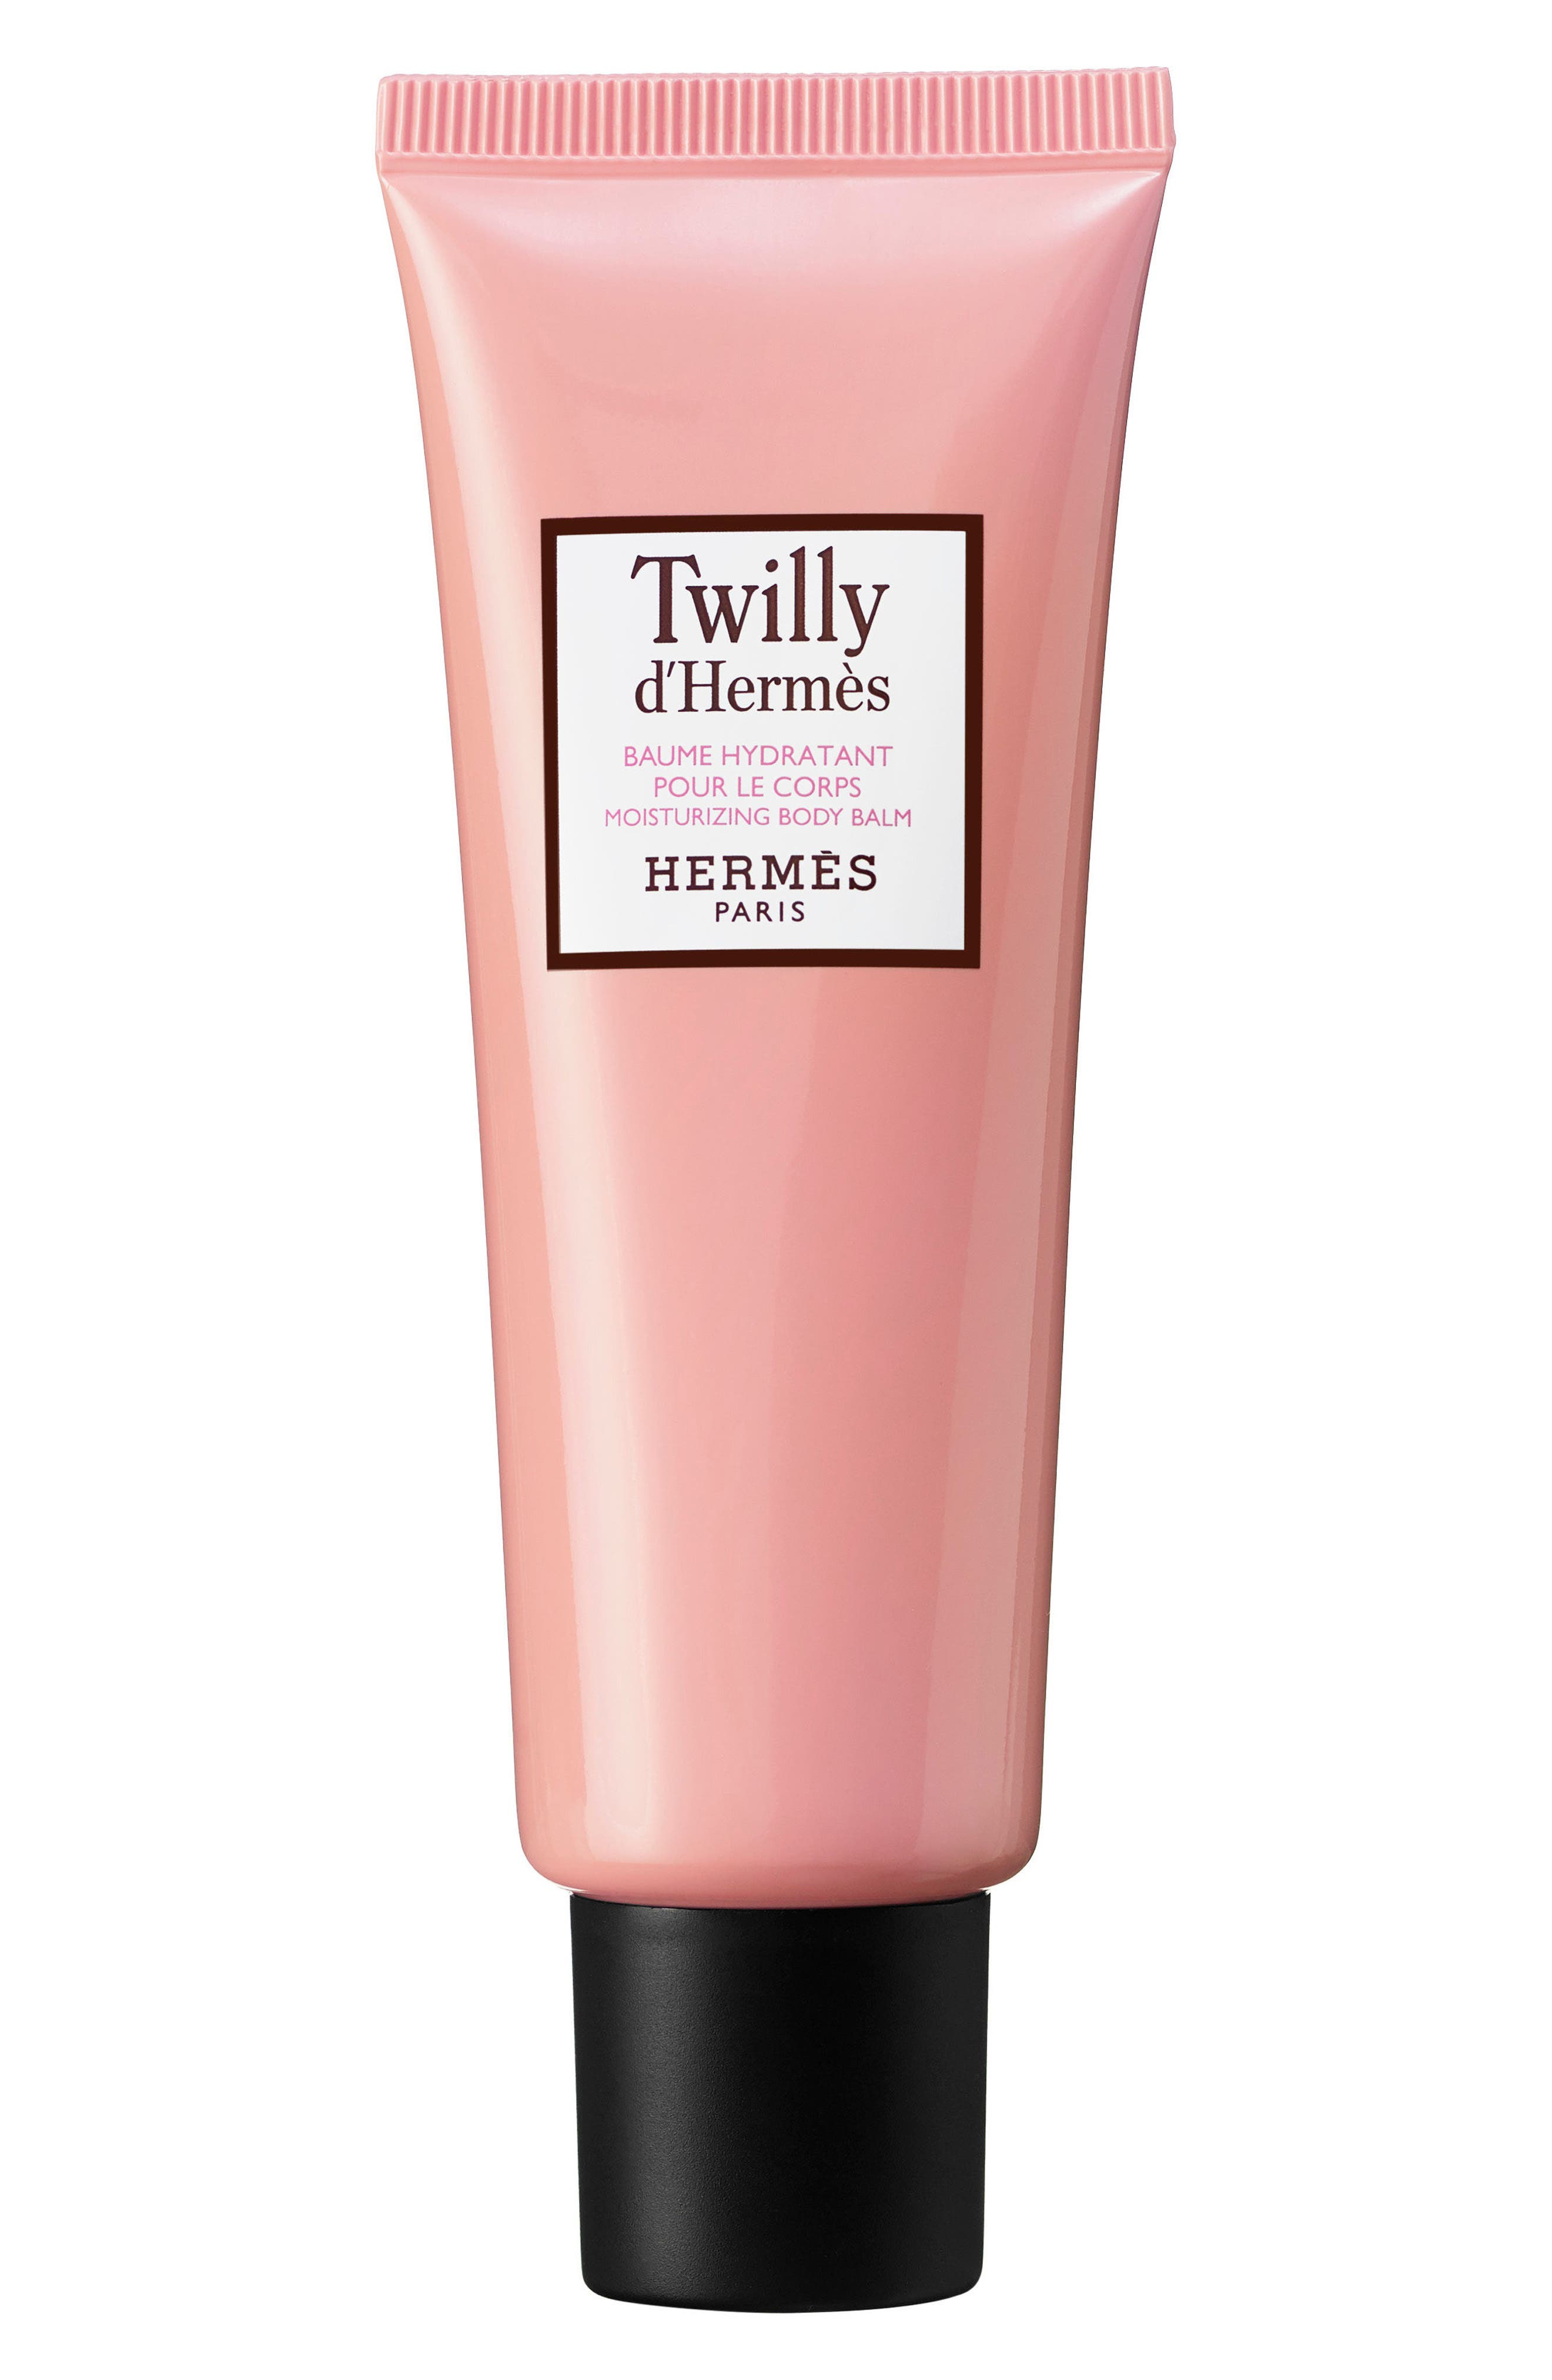 Twilly d'Hermès - Moisturizing body balm,                         Main,                         color, No Color